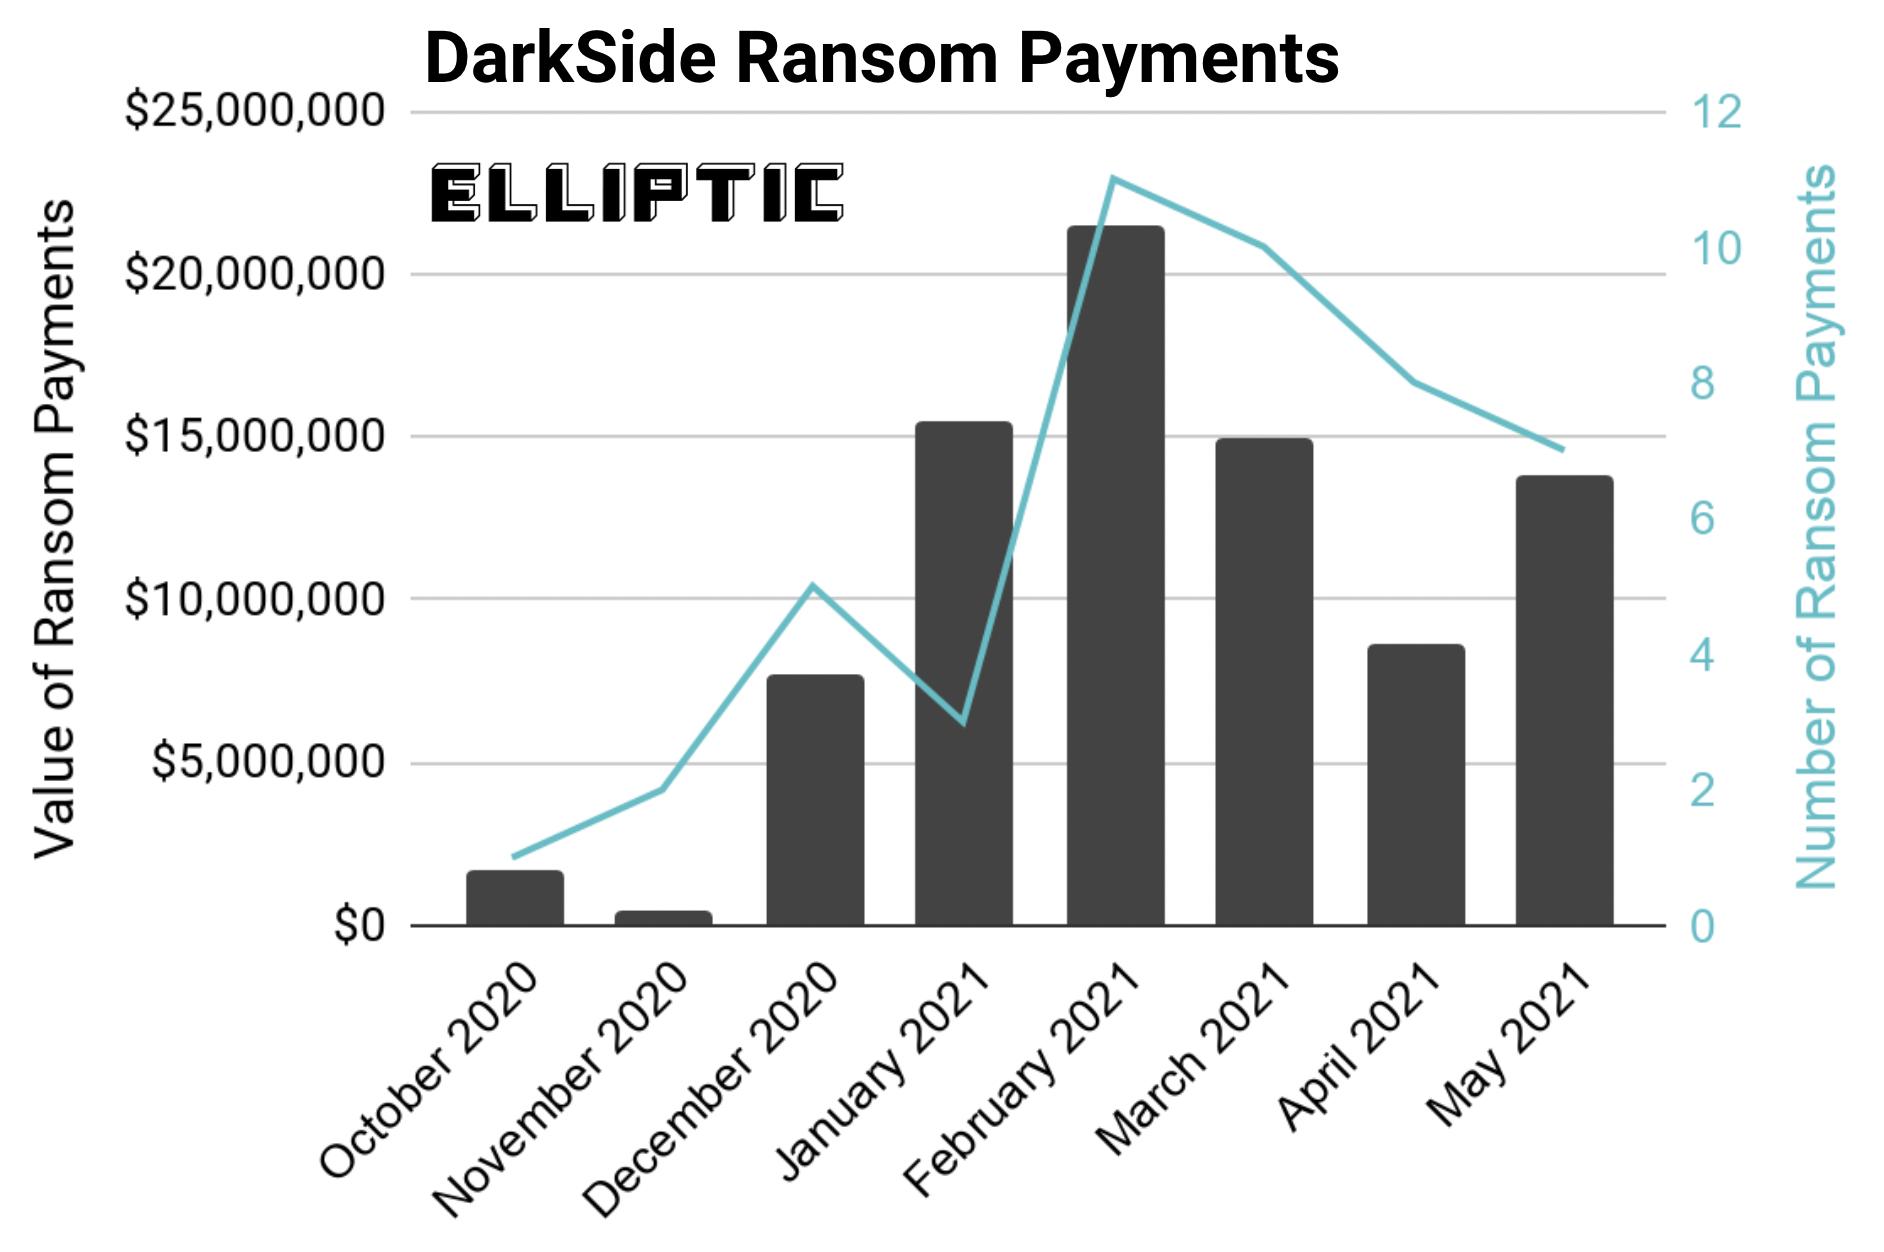 DarkSide ransomware earned $ 90 million in just nine months